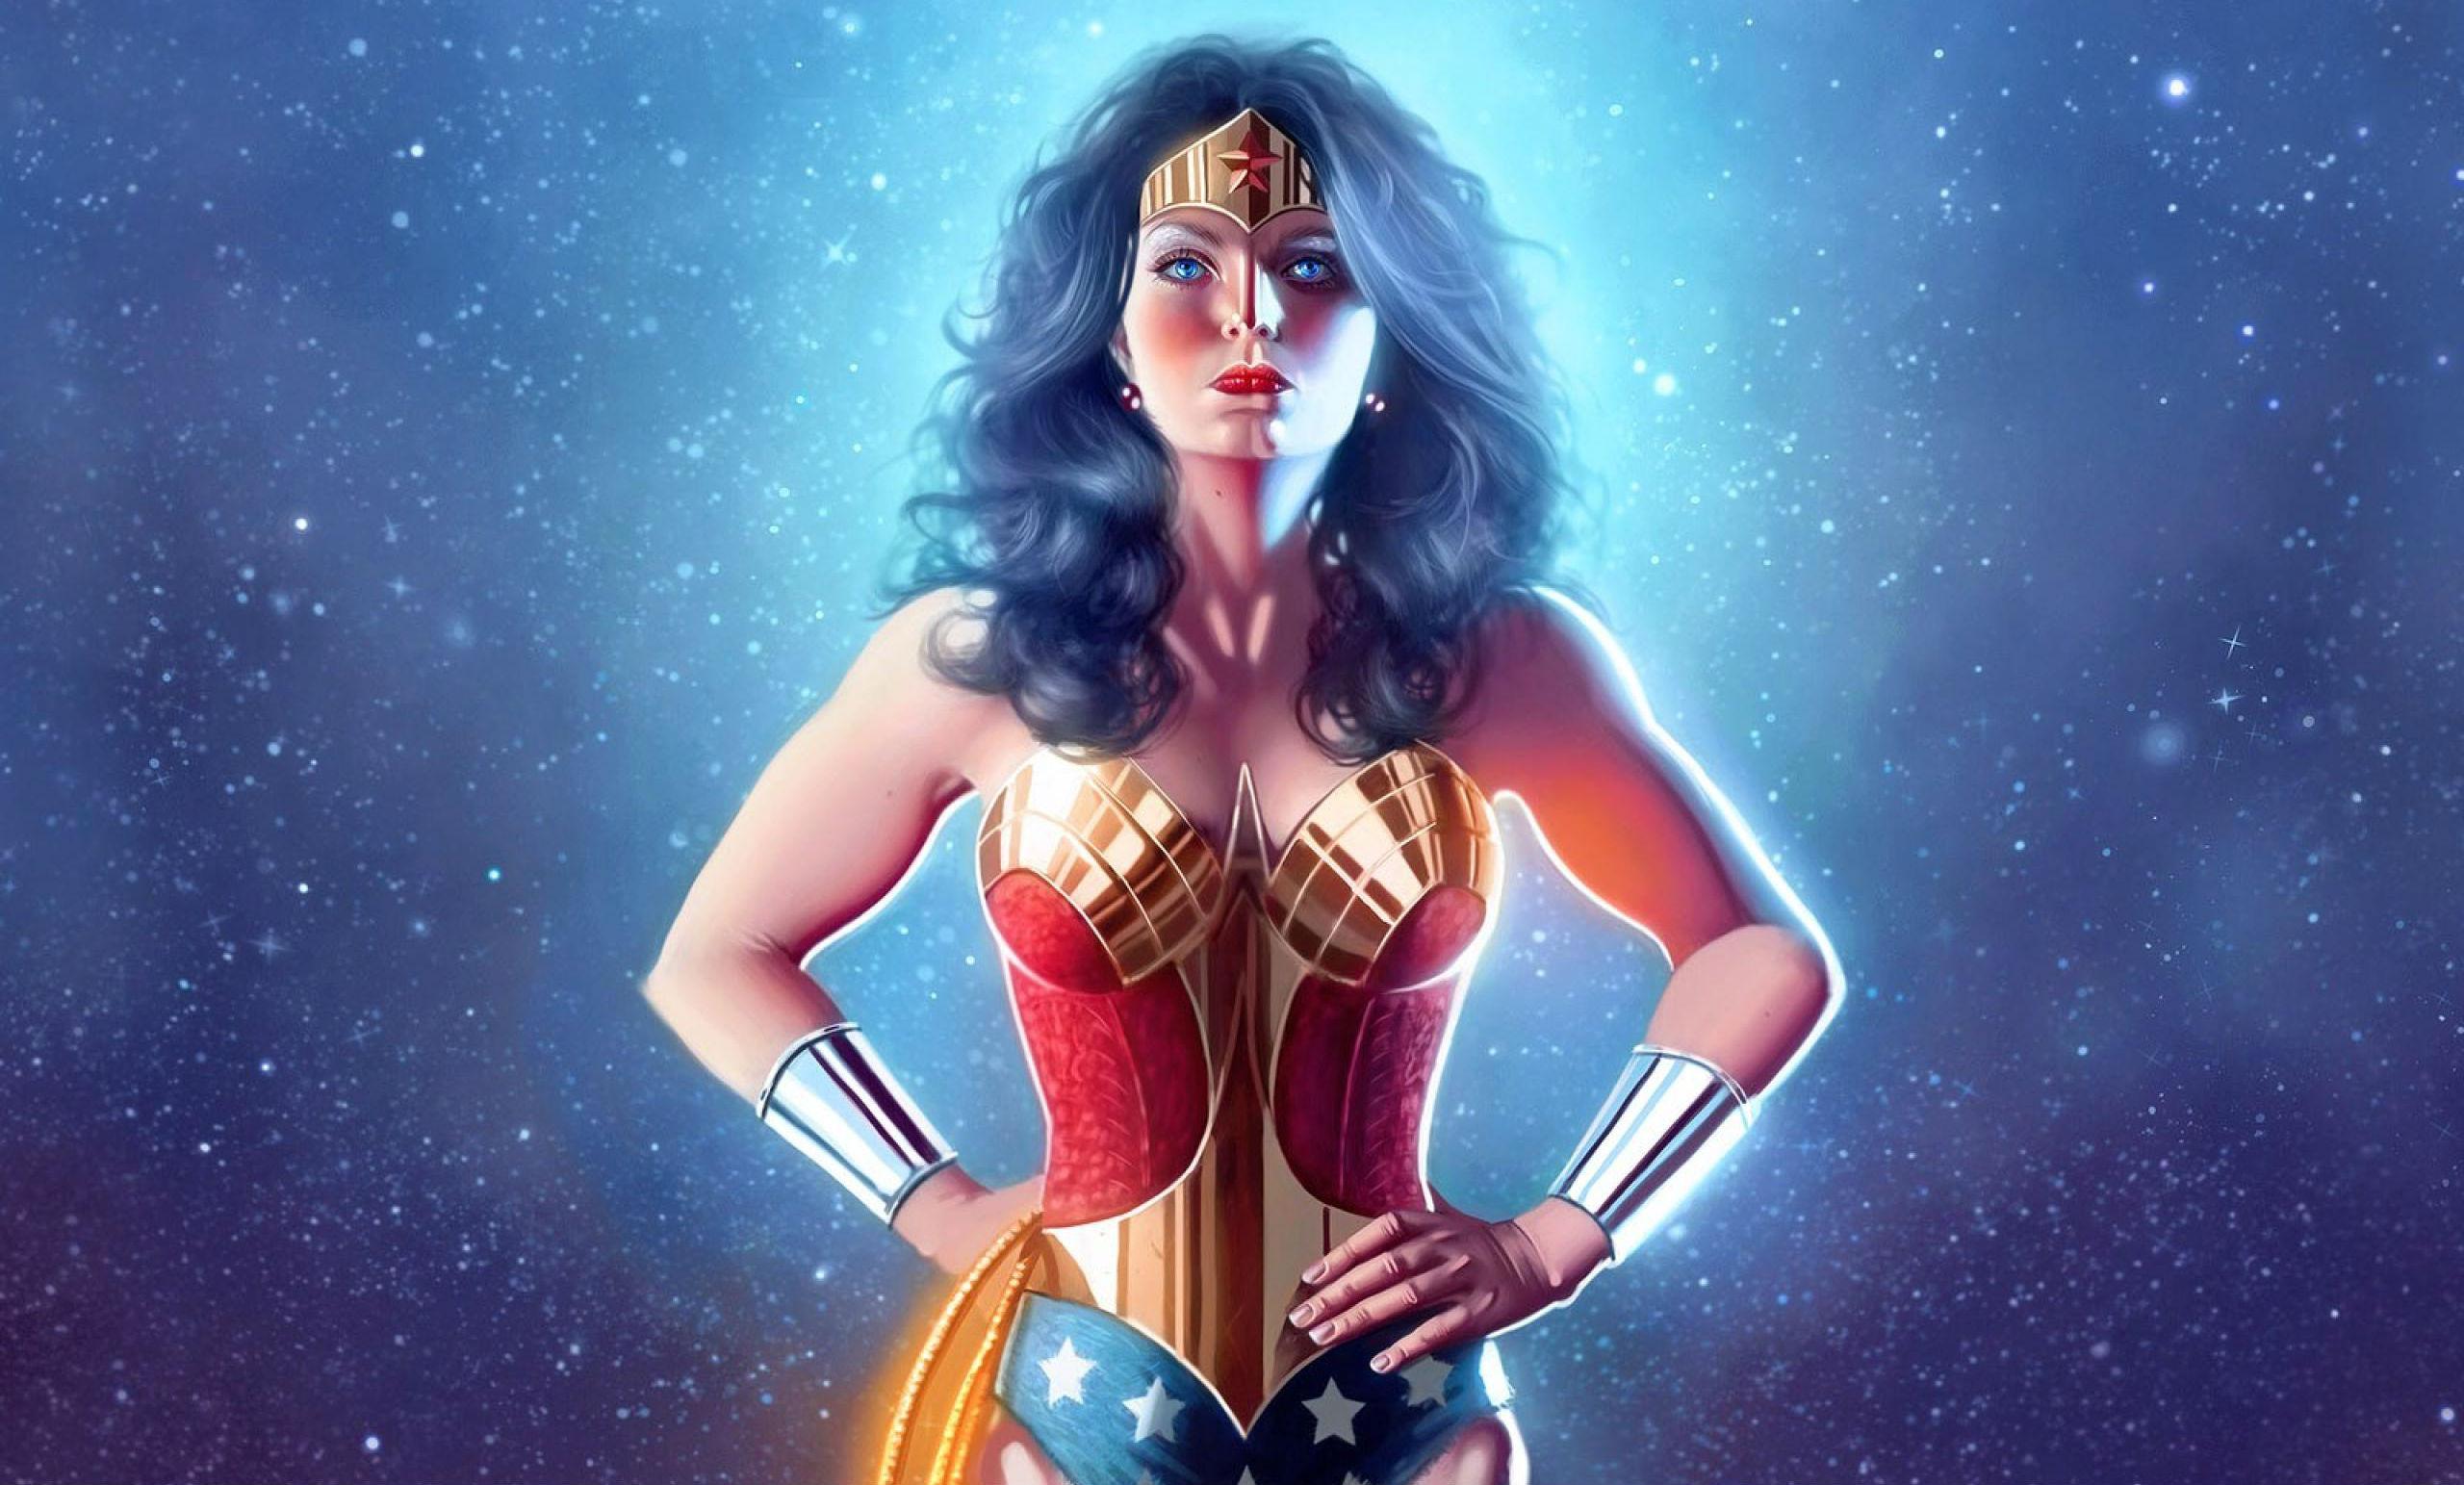 Cool Wonder Woman Wallpaper